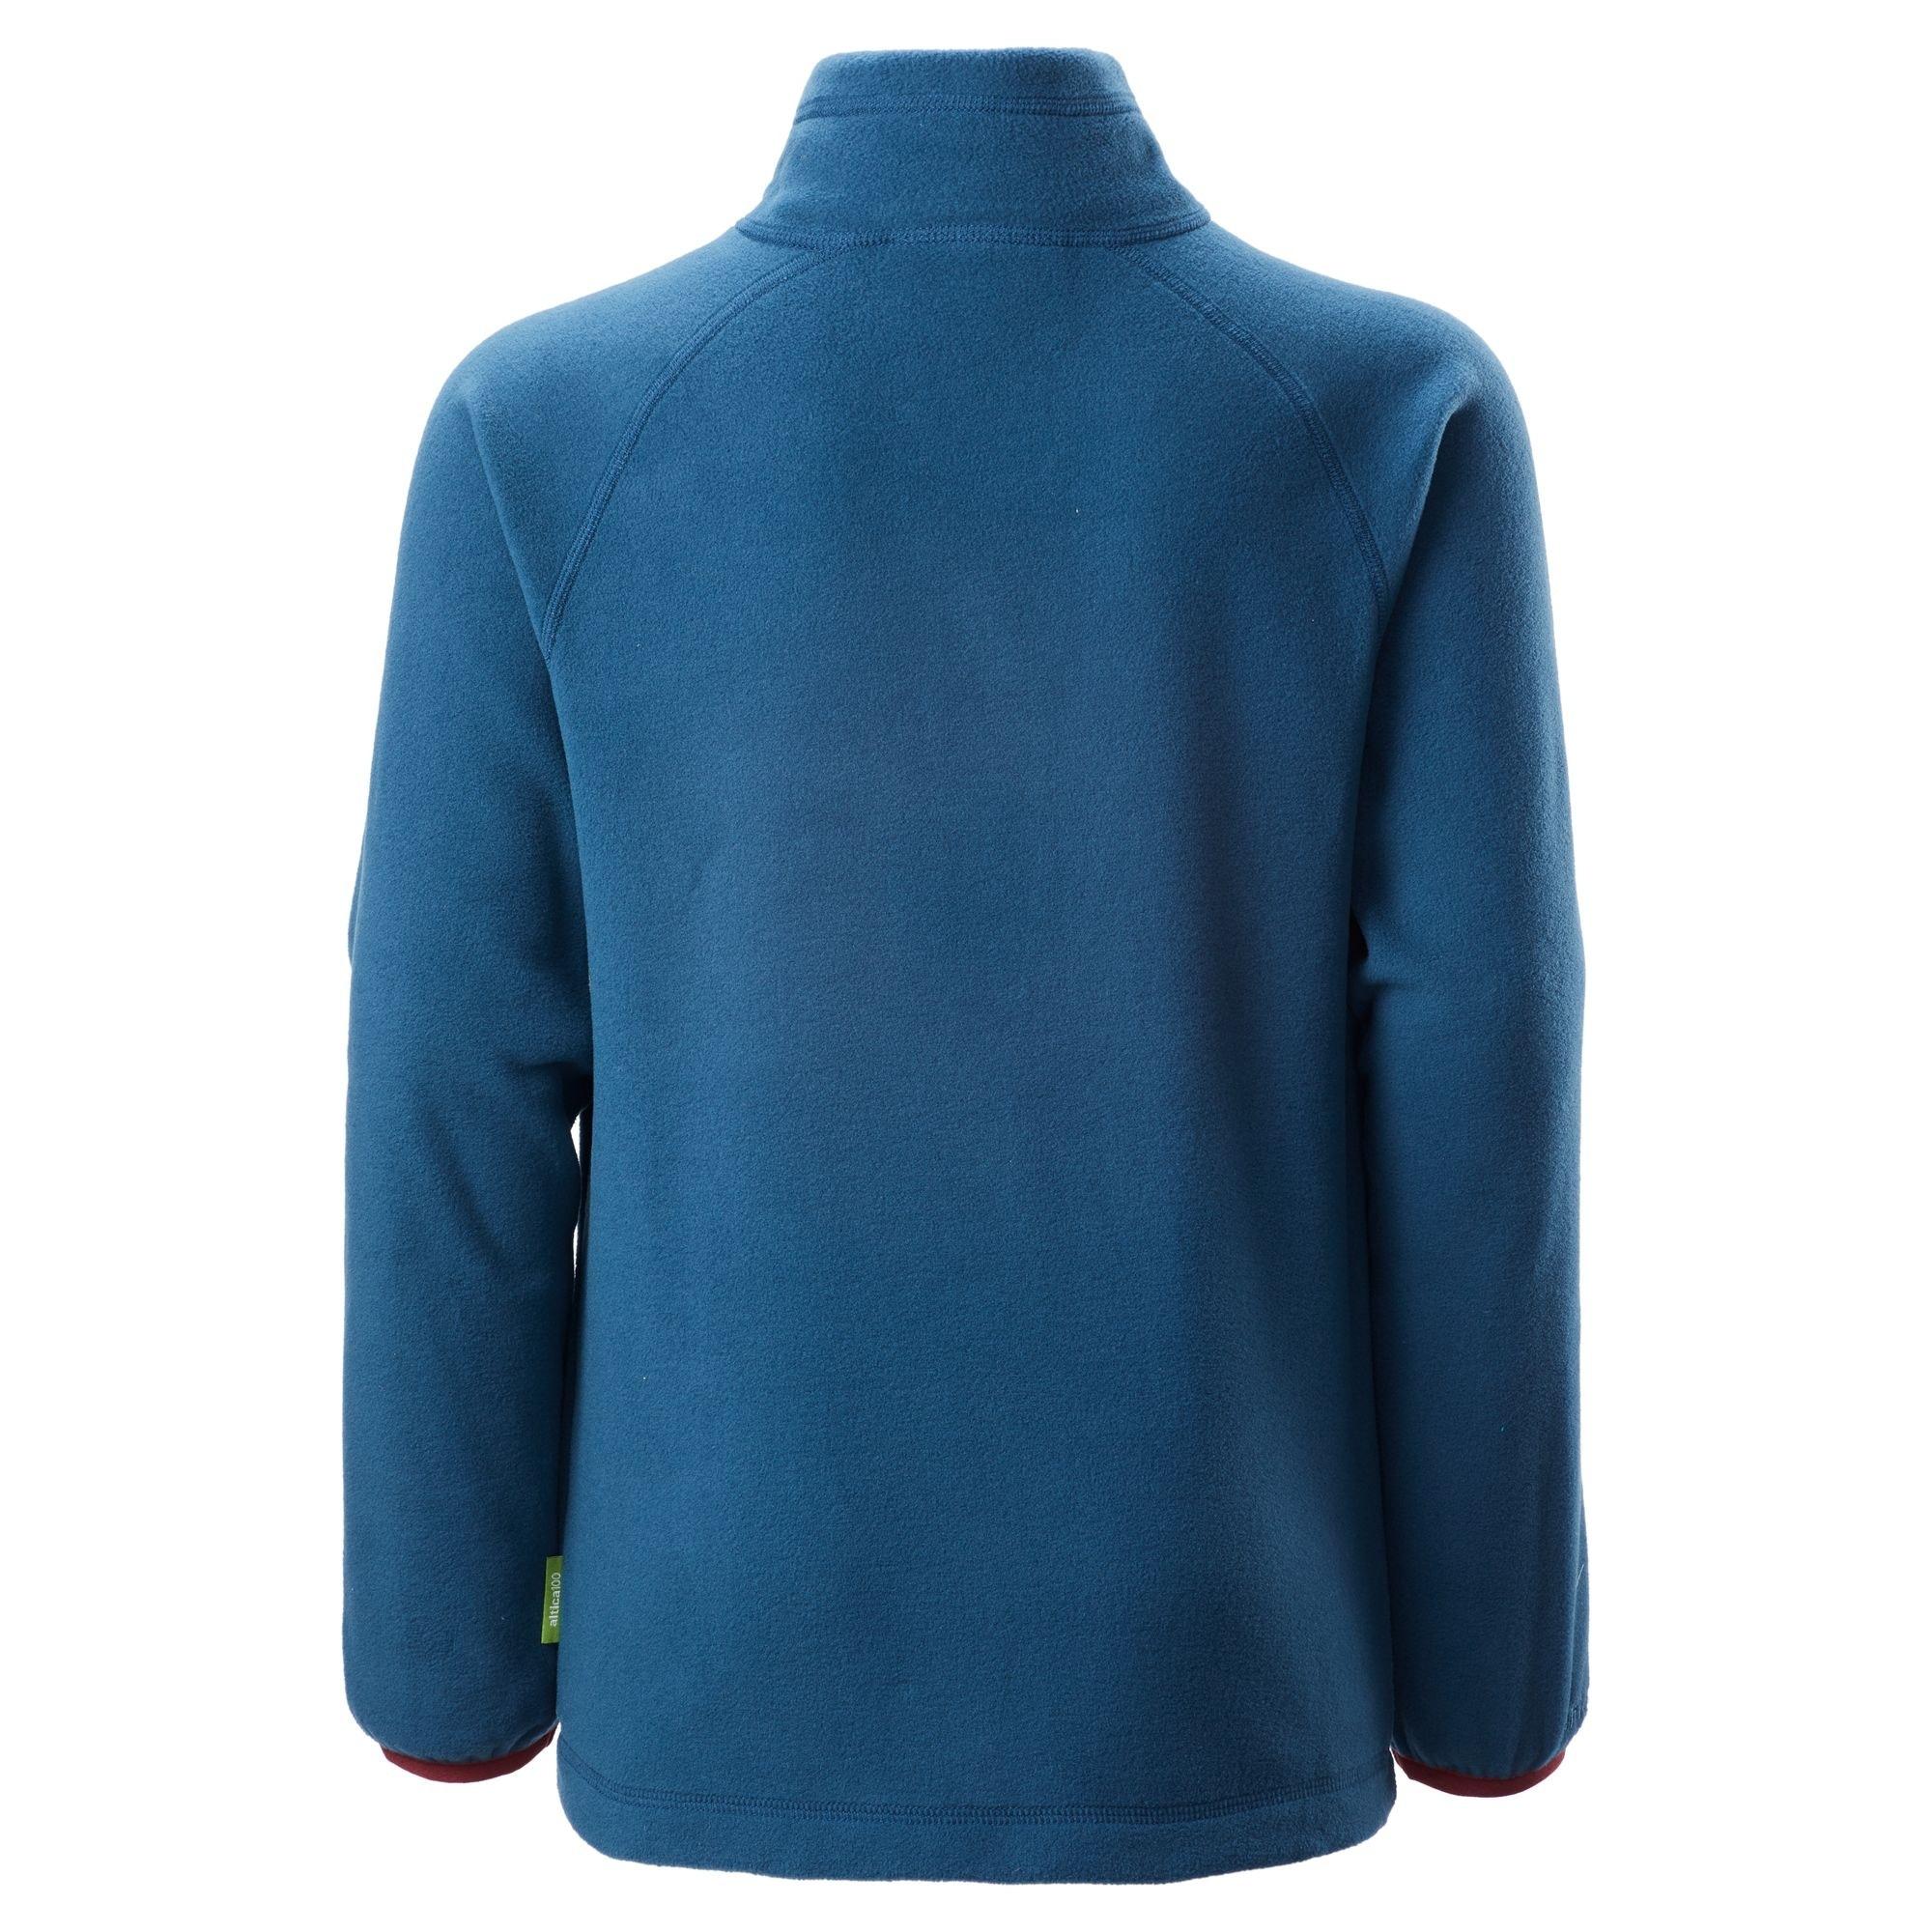 NEW-Kathmandu-Ridge-Kids-039-Girls-039-Boys-039-Warm-Fleece-Jacket-1-4-Zip-Pullover-Top thumbnail 21